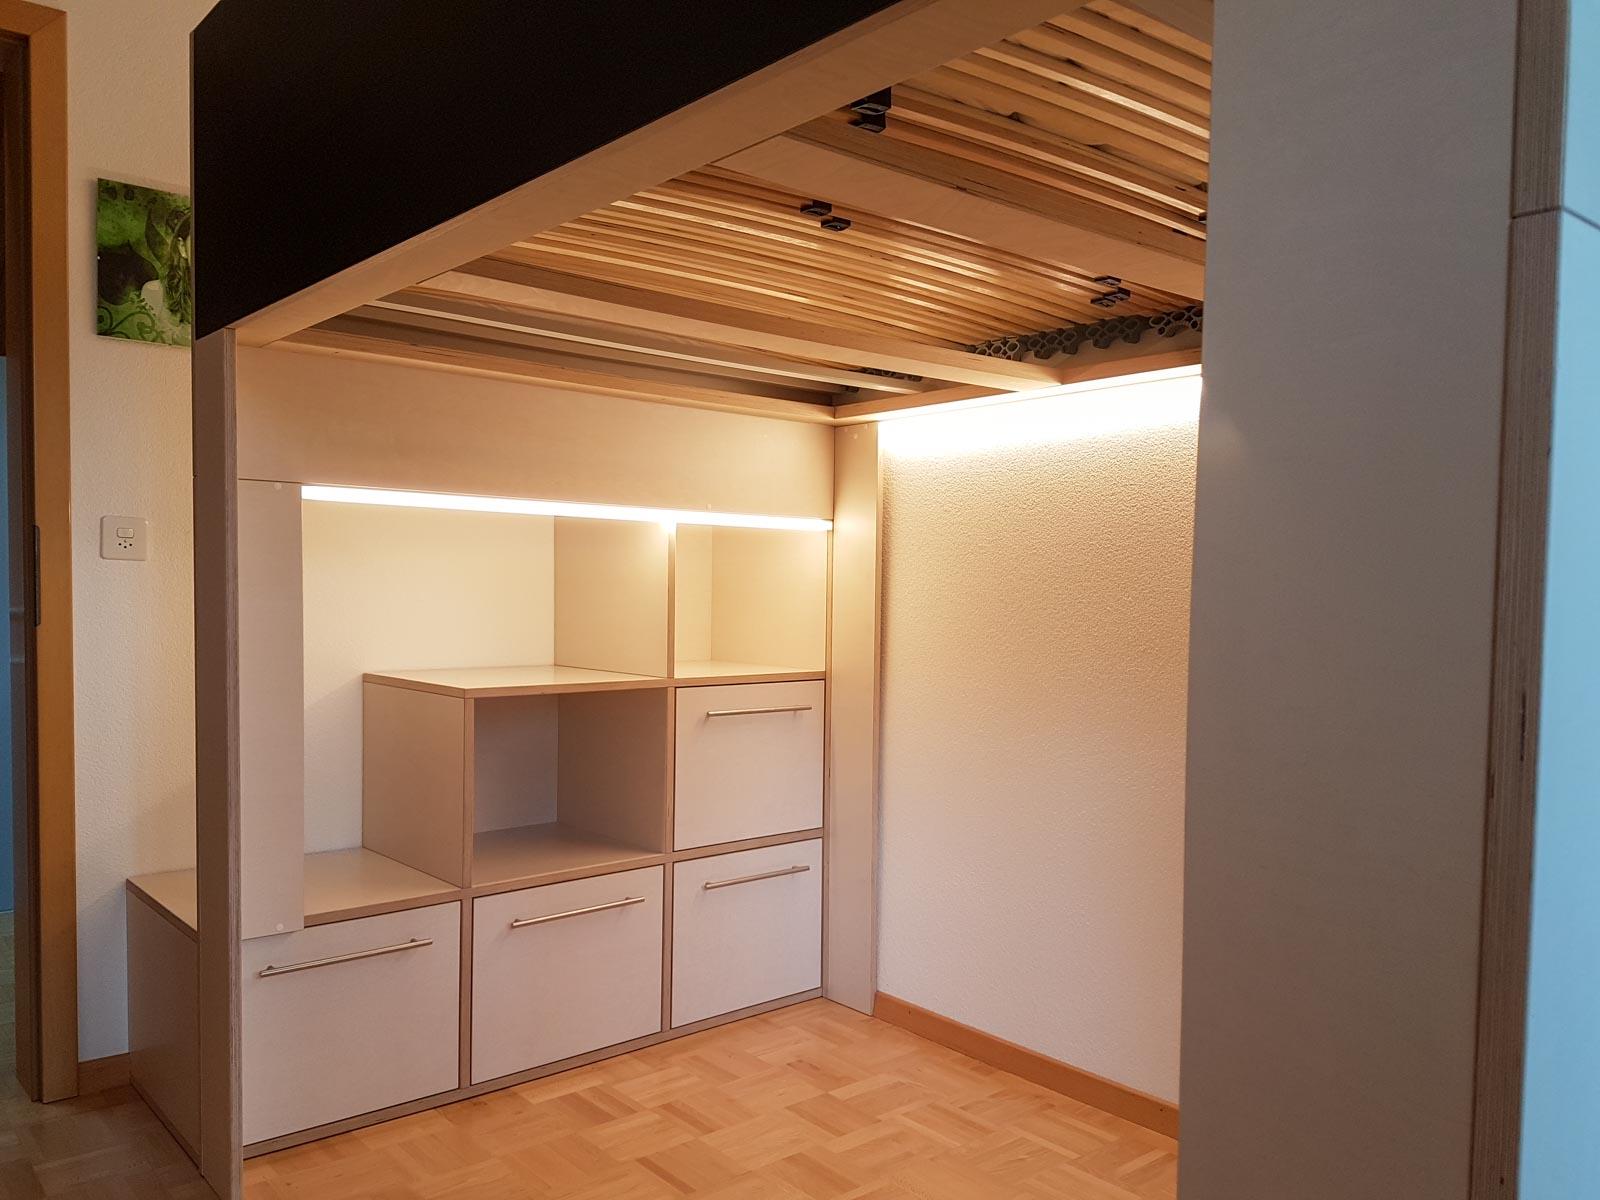 Wooddesign_Jugendzimmer_Jugendbett__Schreibtisch-Verstauraum_ Schubladen_Pinwand_Treppenmöbel_LED-Beleuchtung_Hochbett (6)